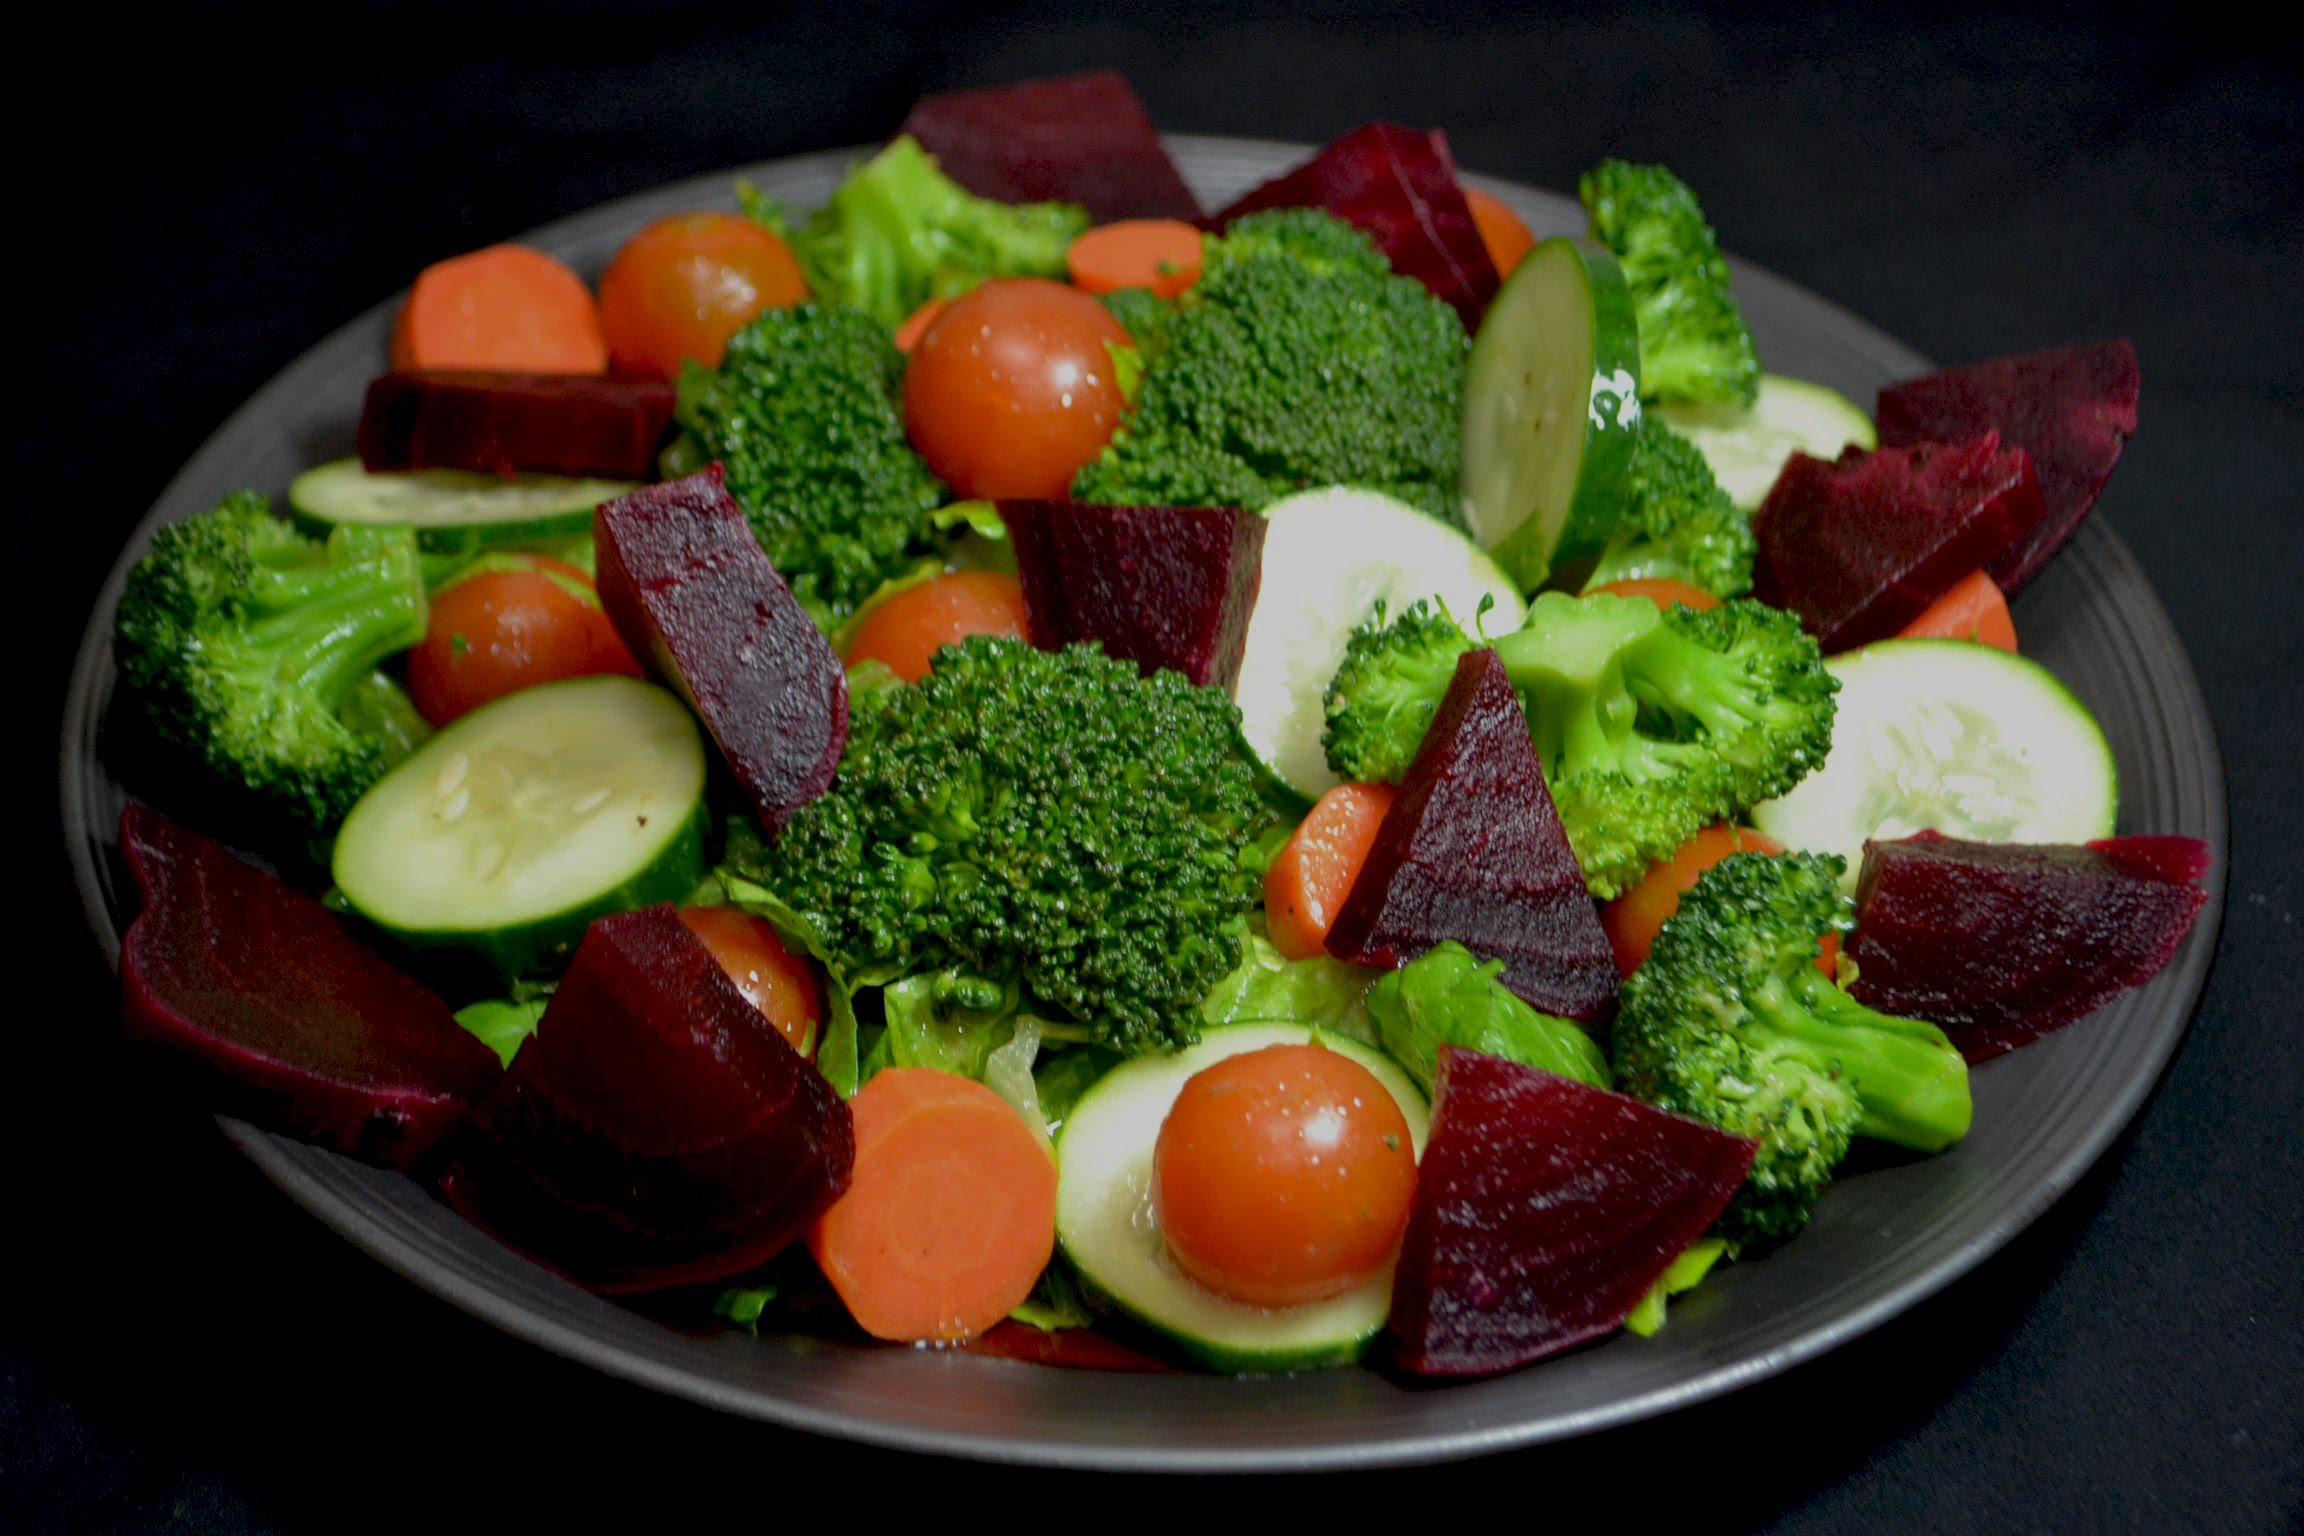 Cómo preparar ensaladas para adelgazar